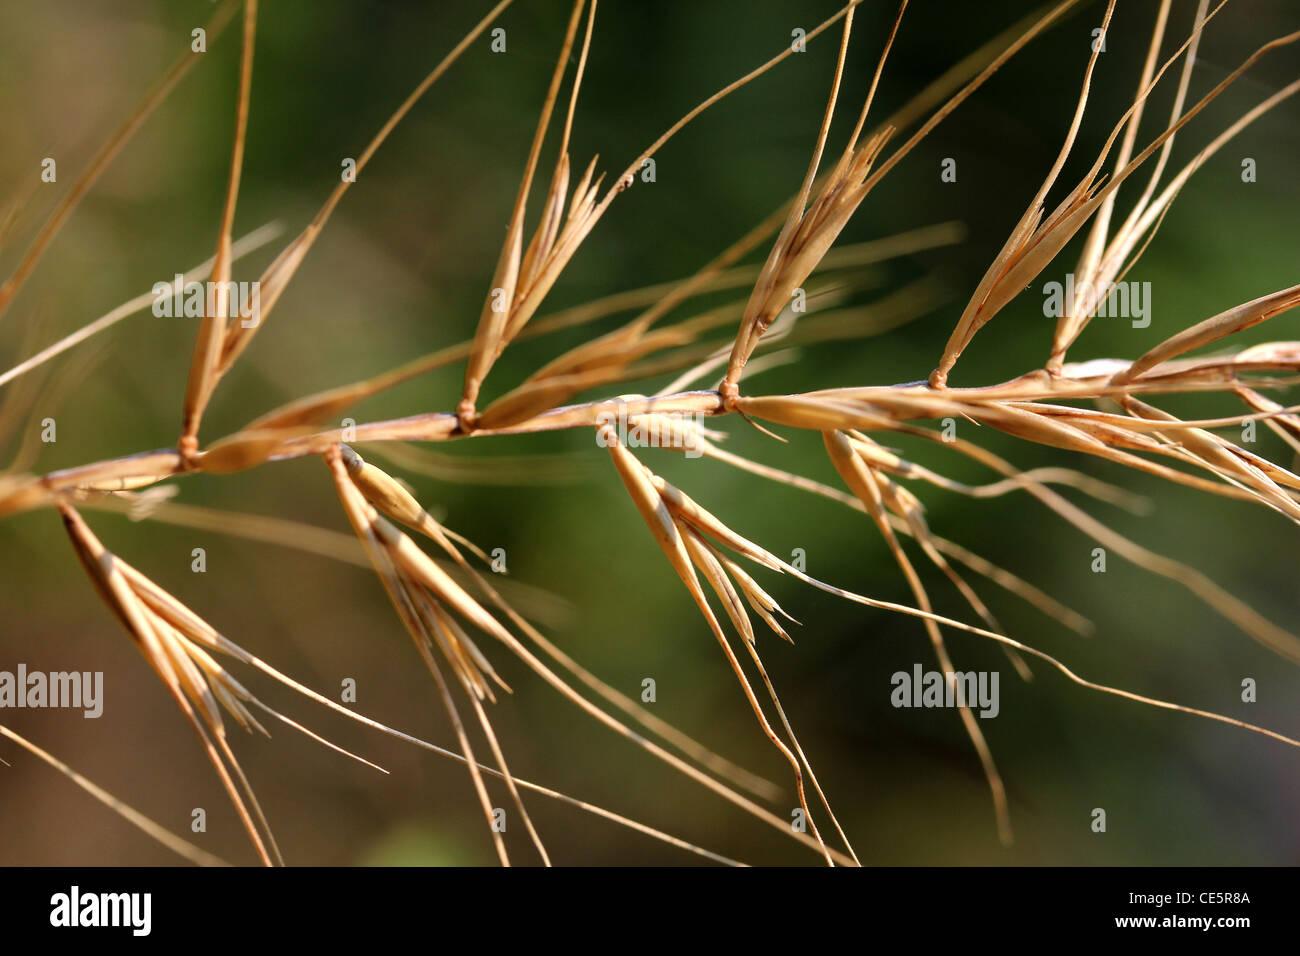 bottlebrush grass seed head - Stock Image